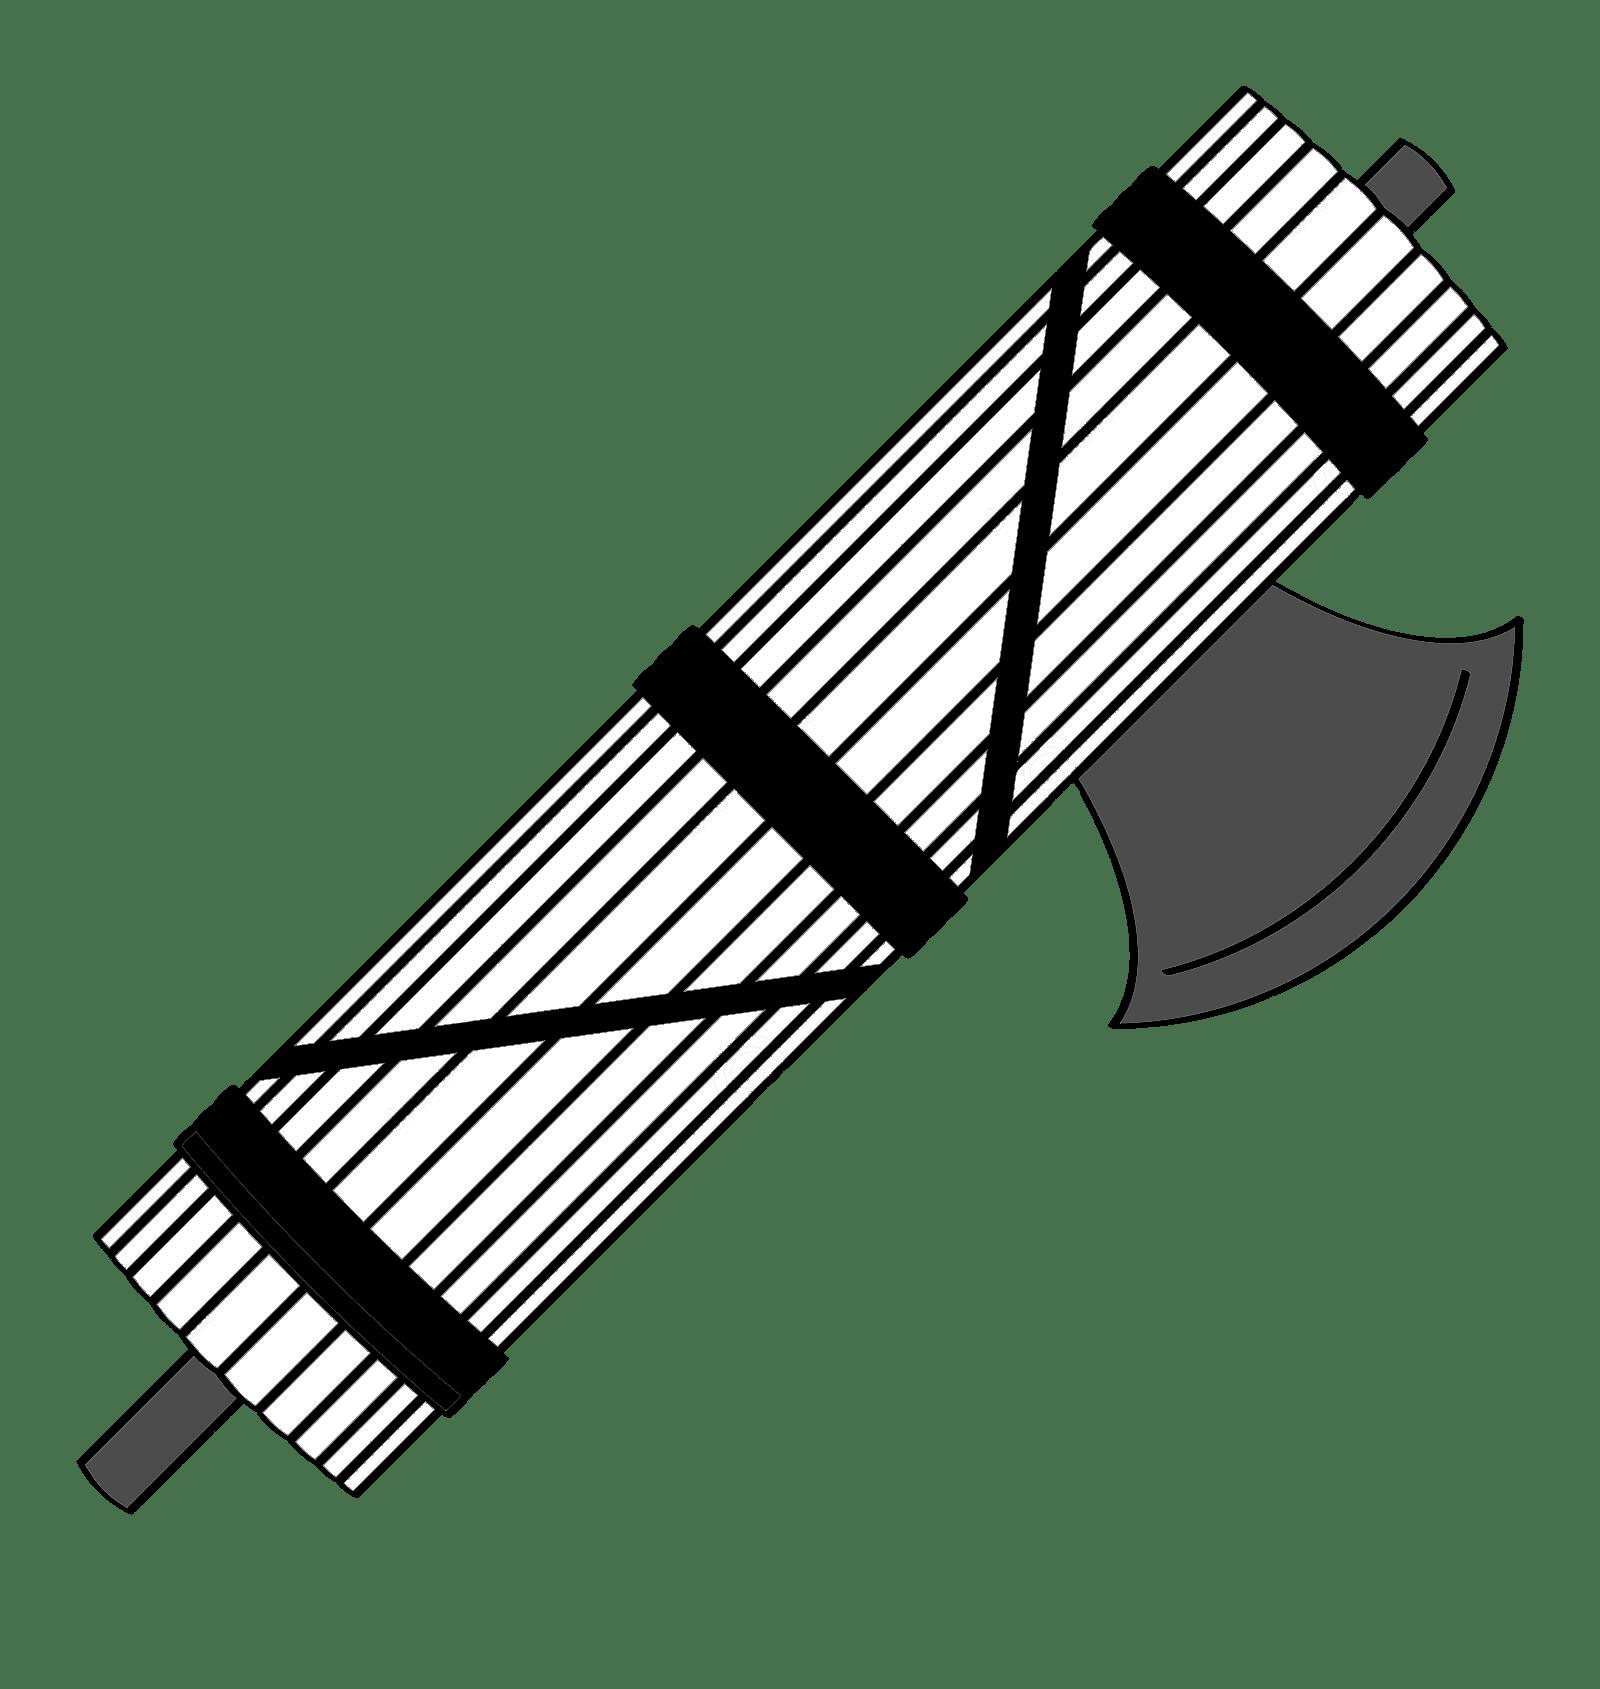 The fasces was the premier symbol of Italian fascism